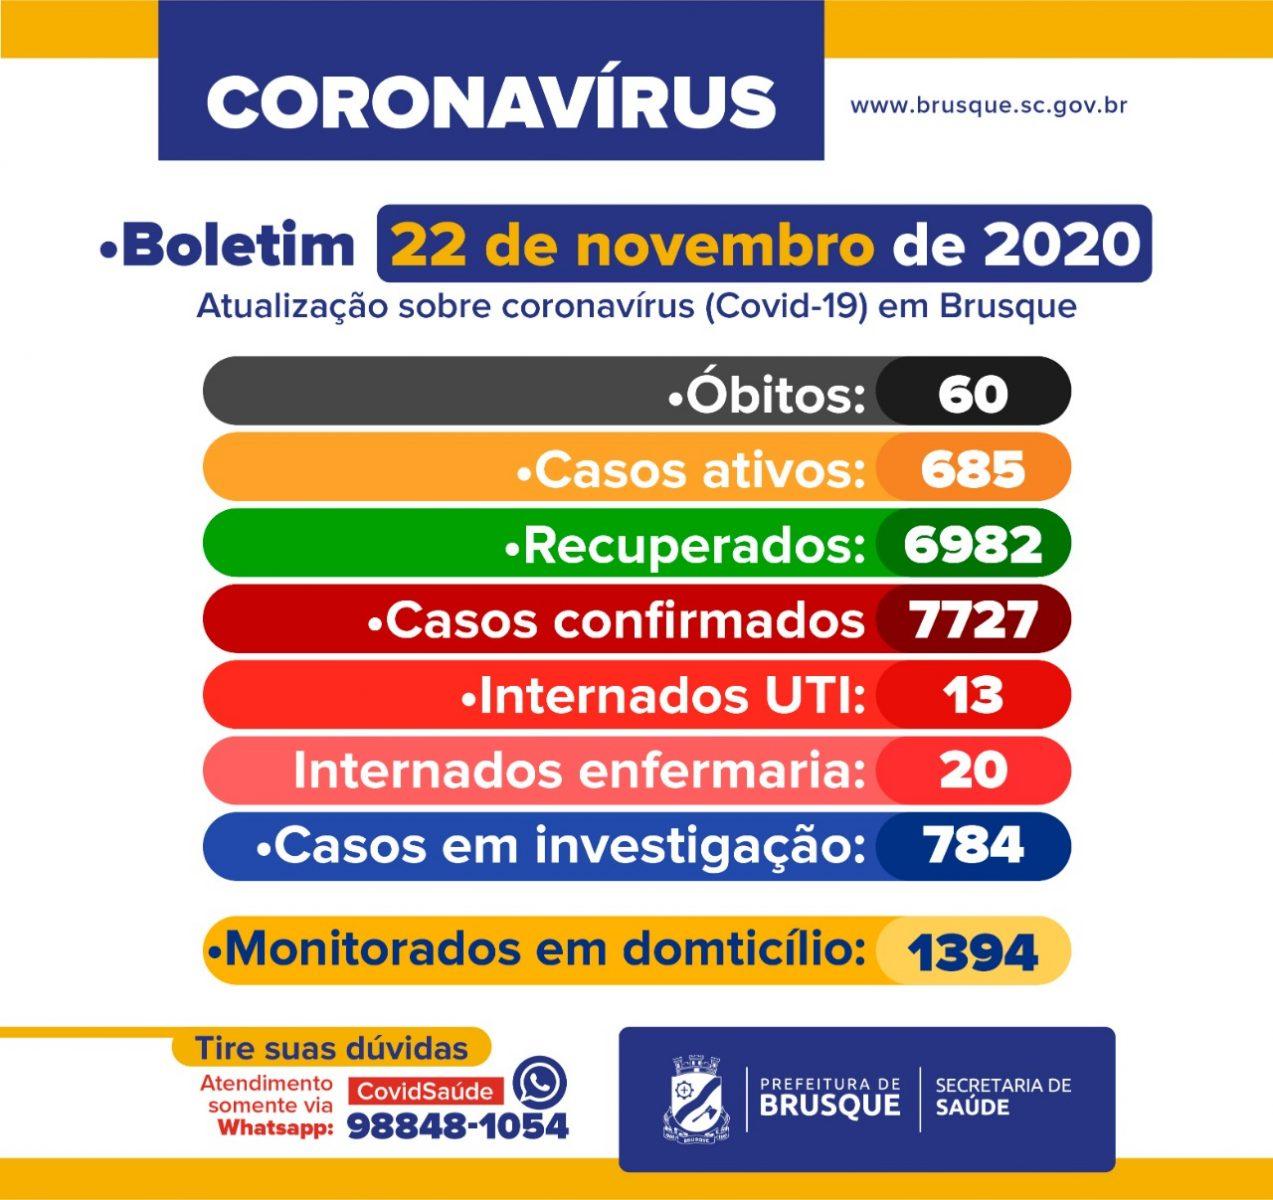 COVID-19: Boletim epidemiológico 22 de novembro